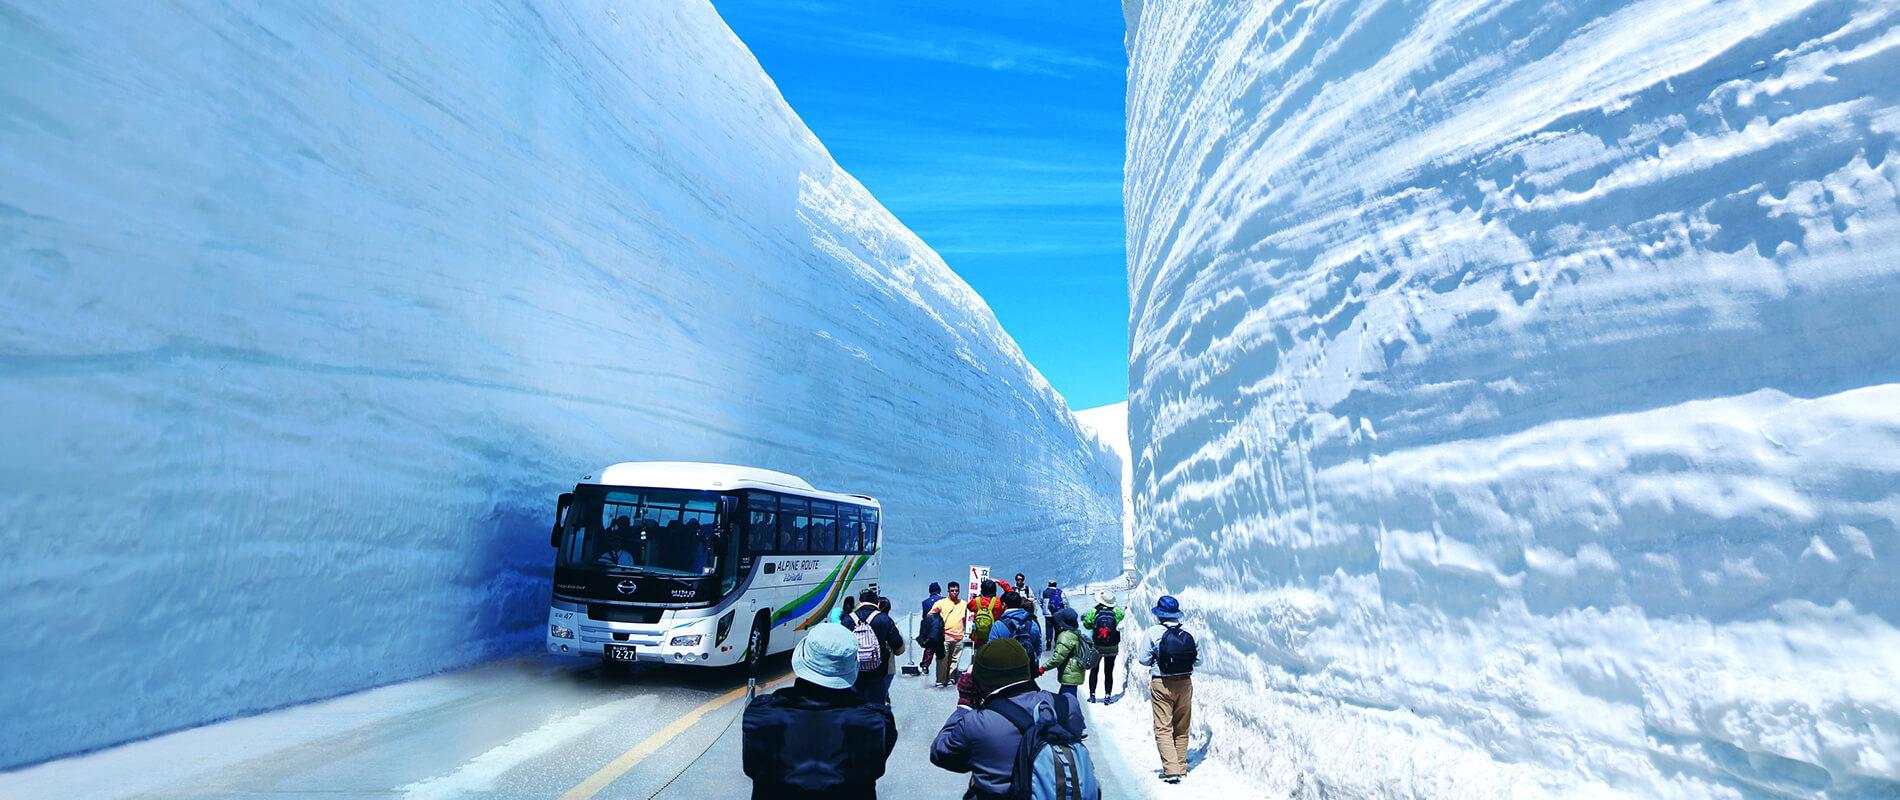 Tateyama Kurobe Alpine Route, the Great Wall of Snow